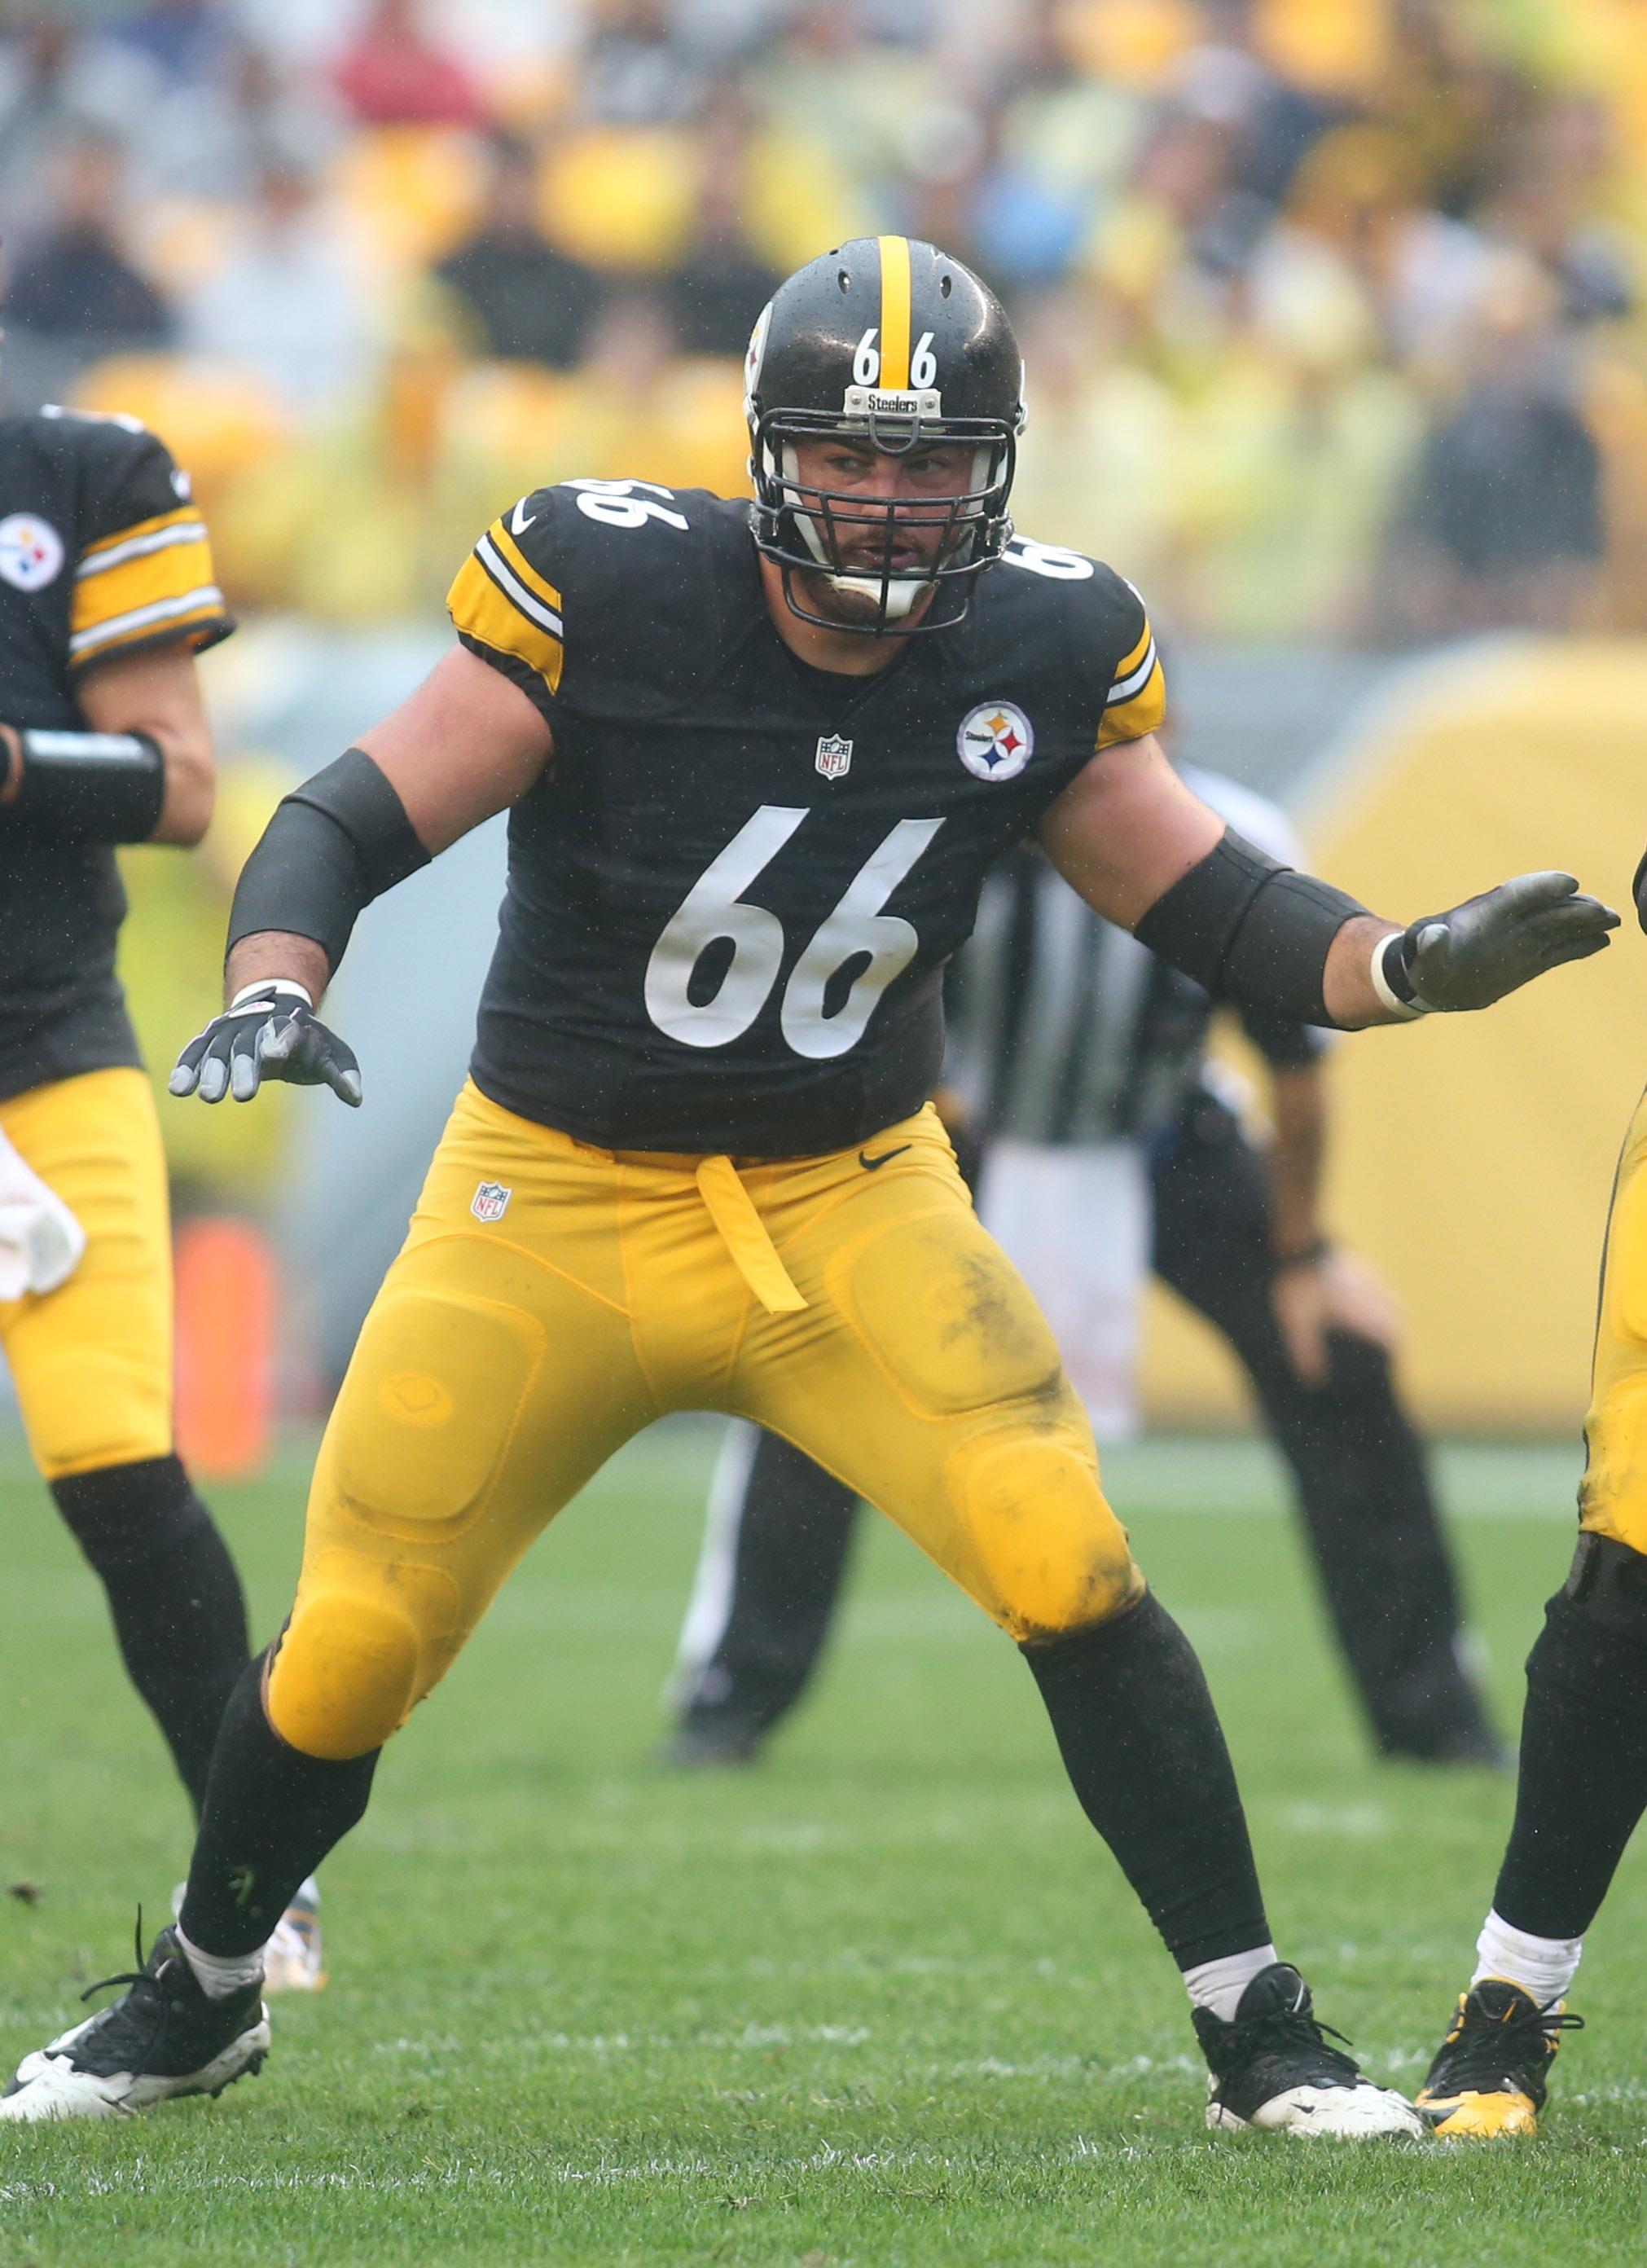 NFL: Cincinnati Bengals at Pittsburgh Steelers